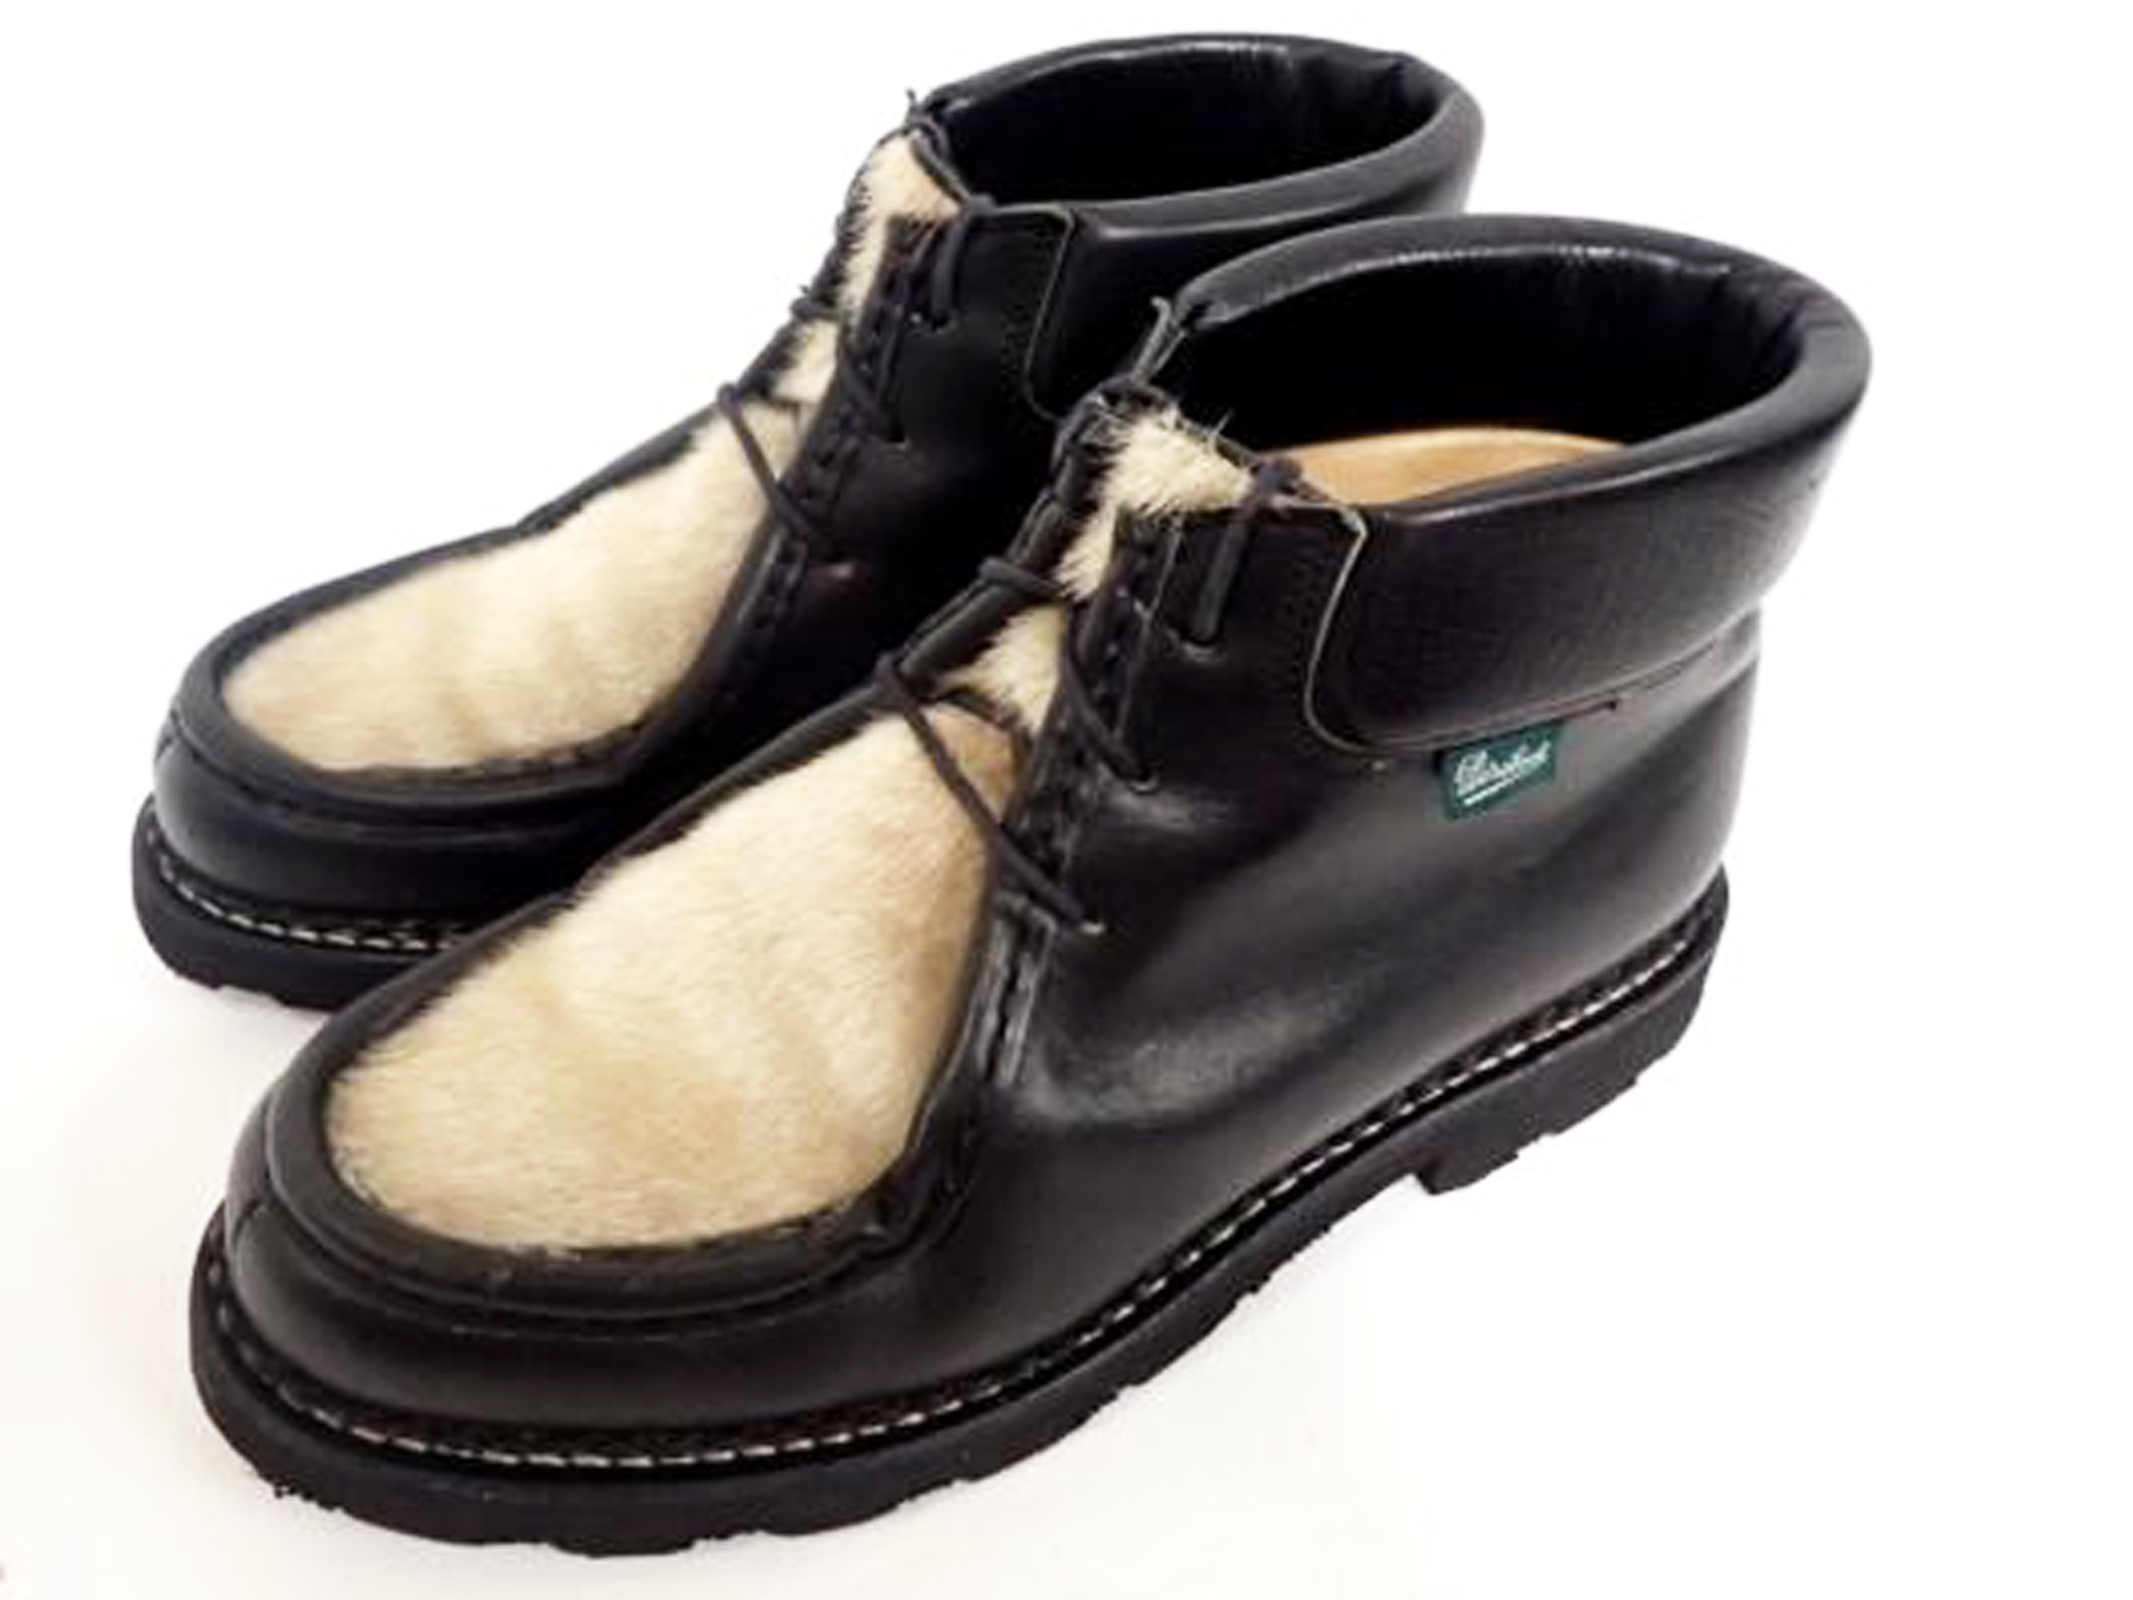 Paraboot パラブーツ UA別注 MILLY ミリー フォック ハイカット チロリアンシューズ ブーツを埼玉県川越市にお住いのお客様より店頭買取にて高価買取いたしました。